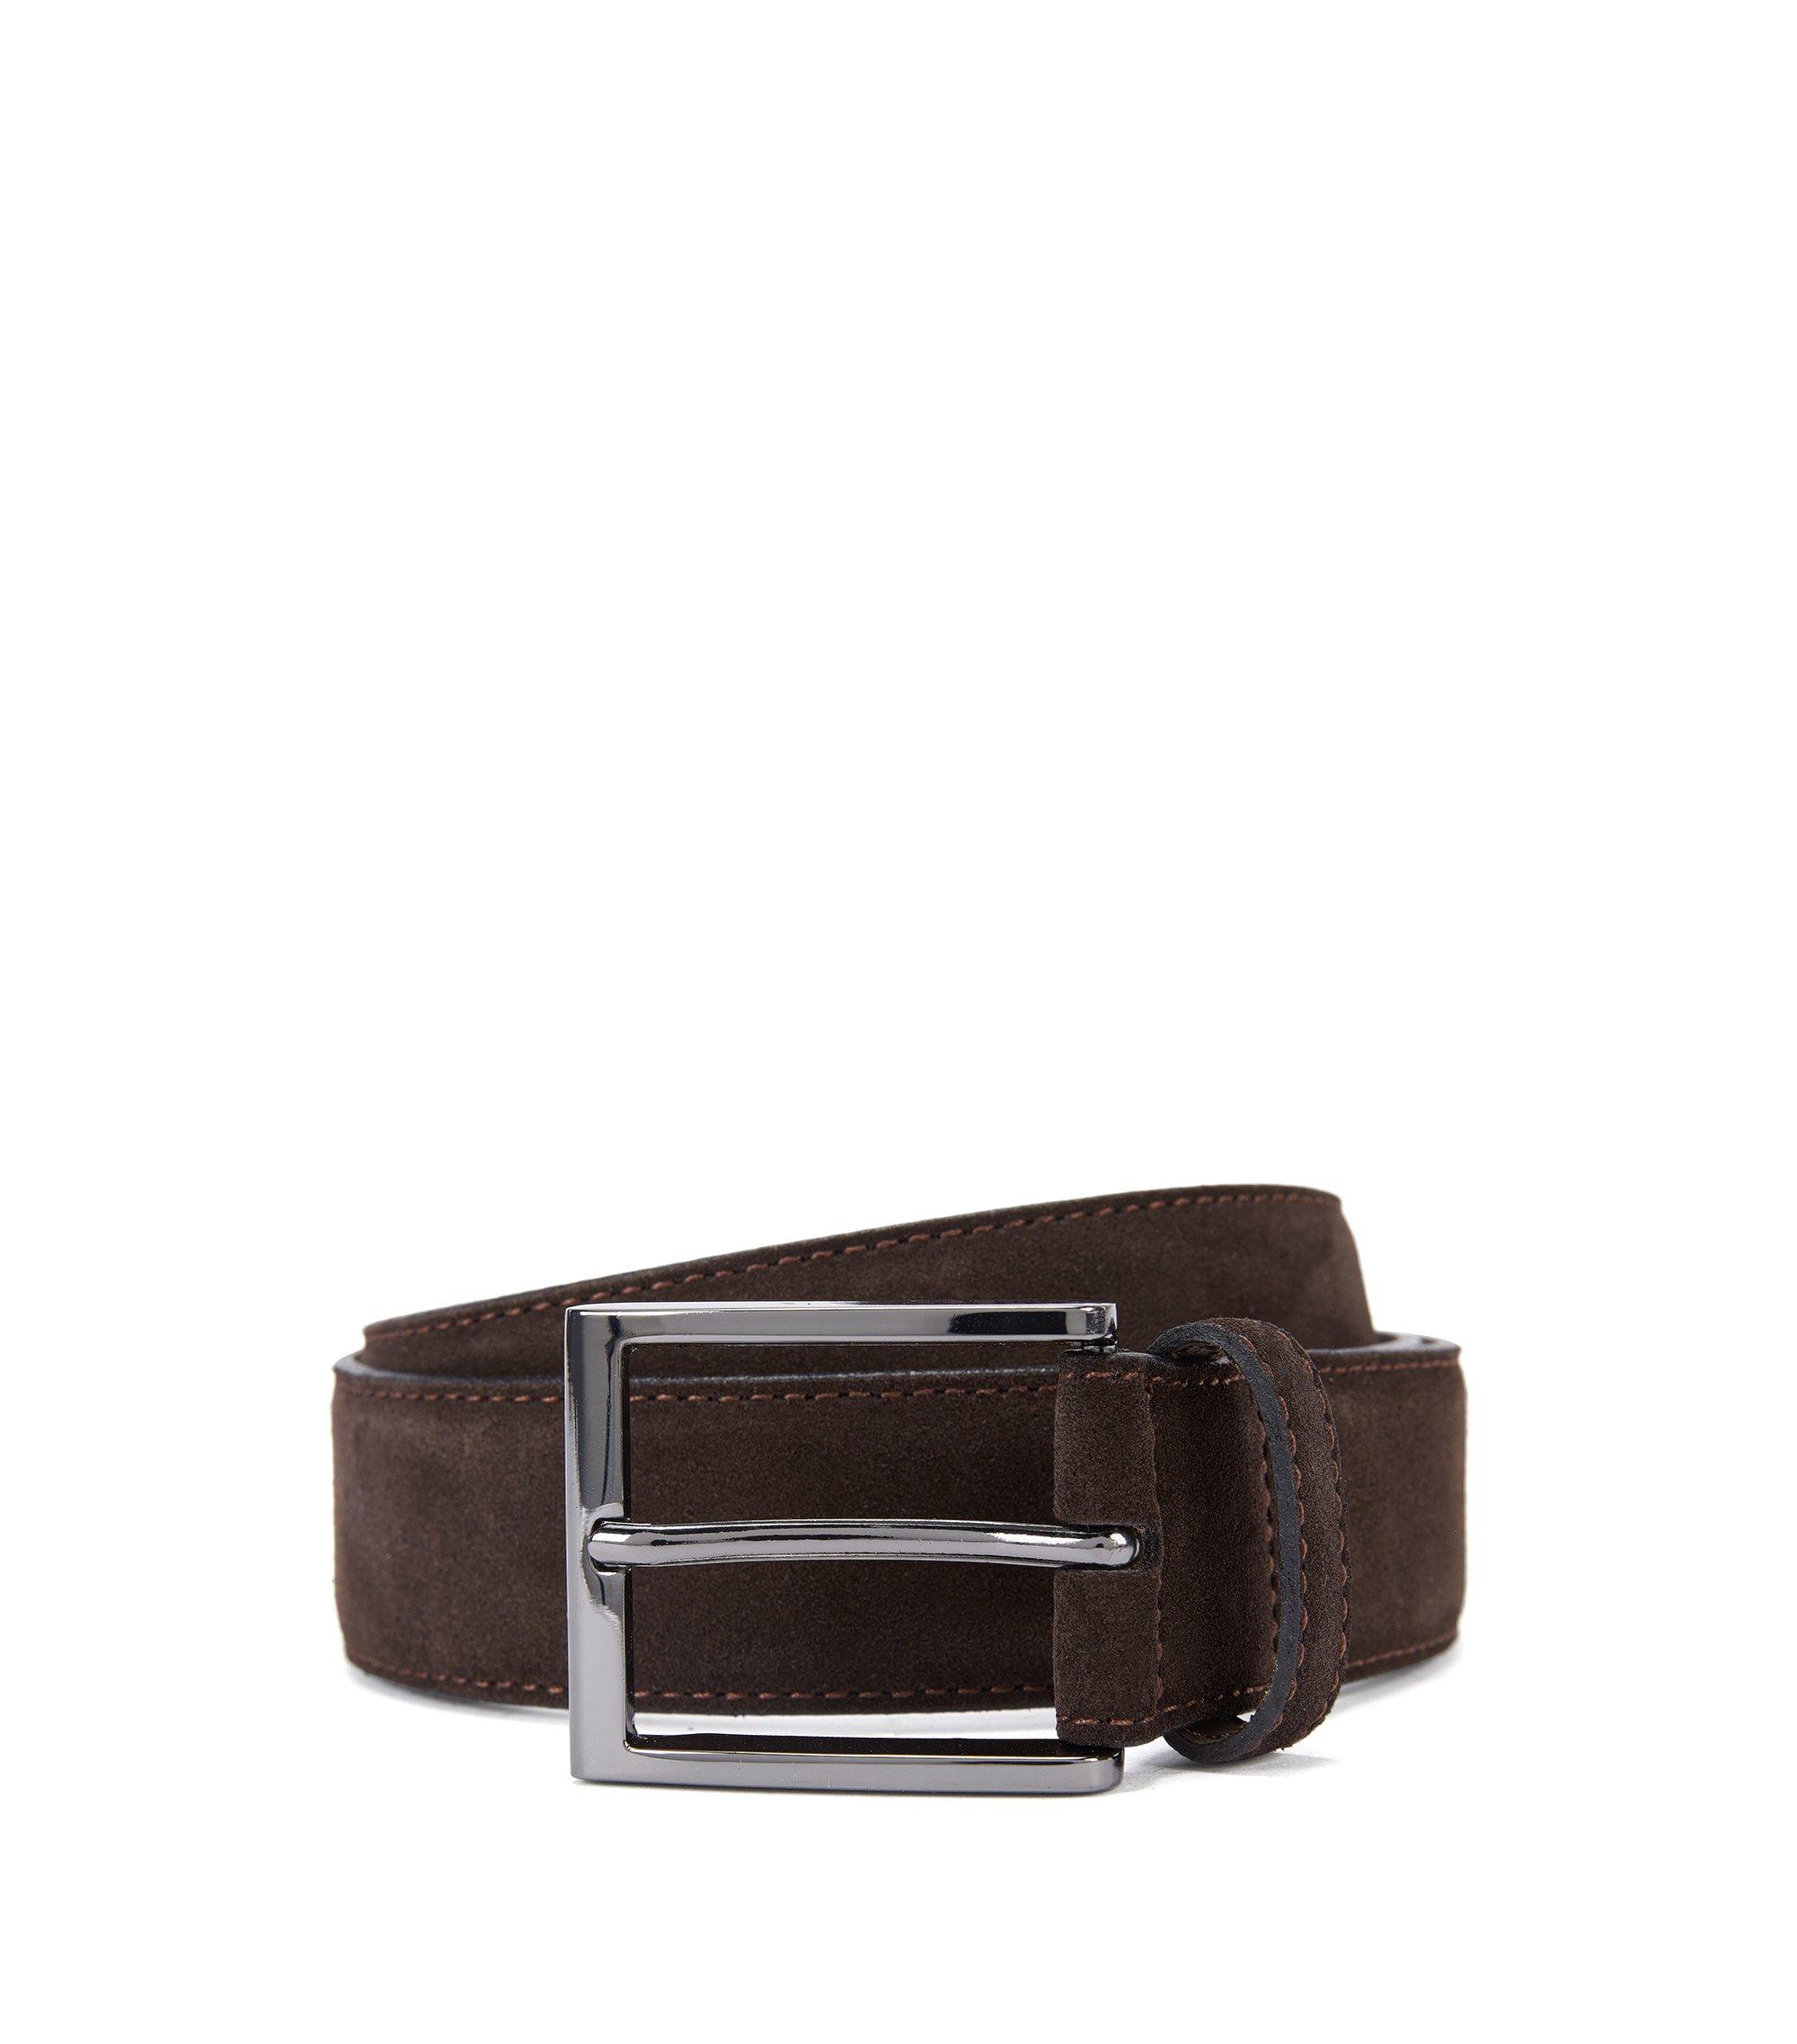 Cintura in pelle scamosciata con punta in metallo griffata , Marrone scuro